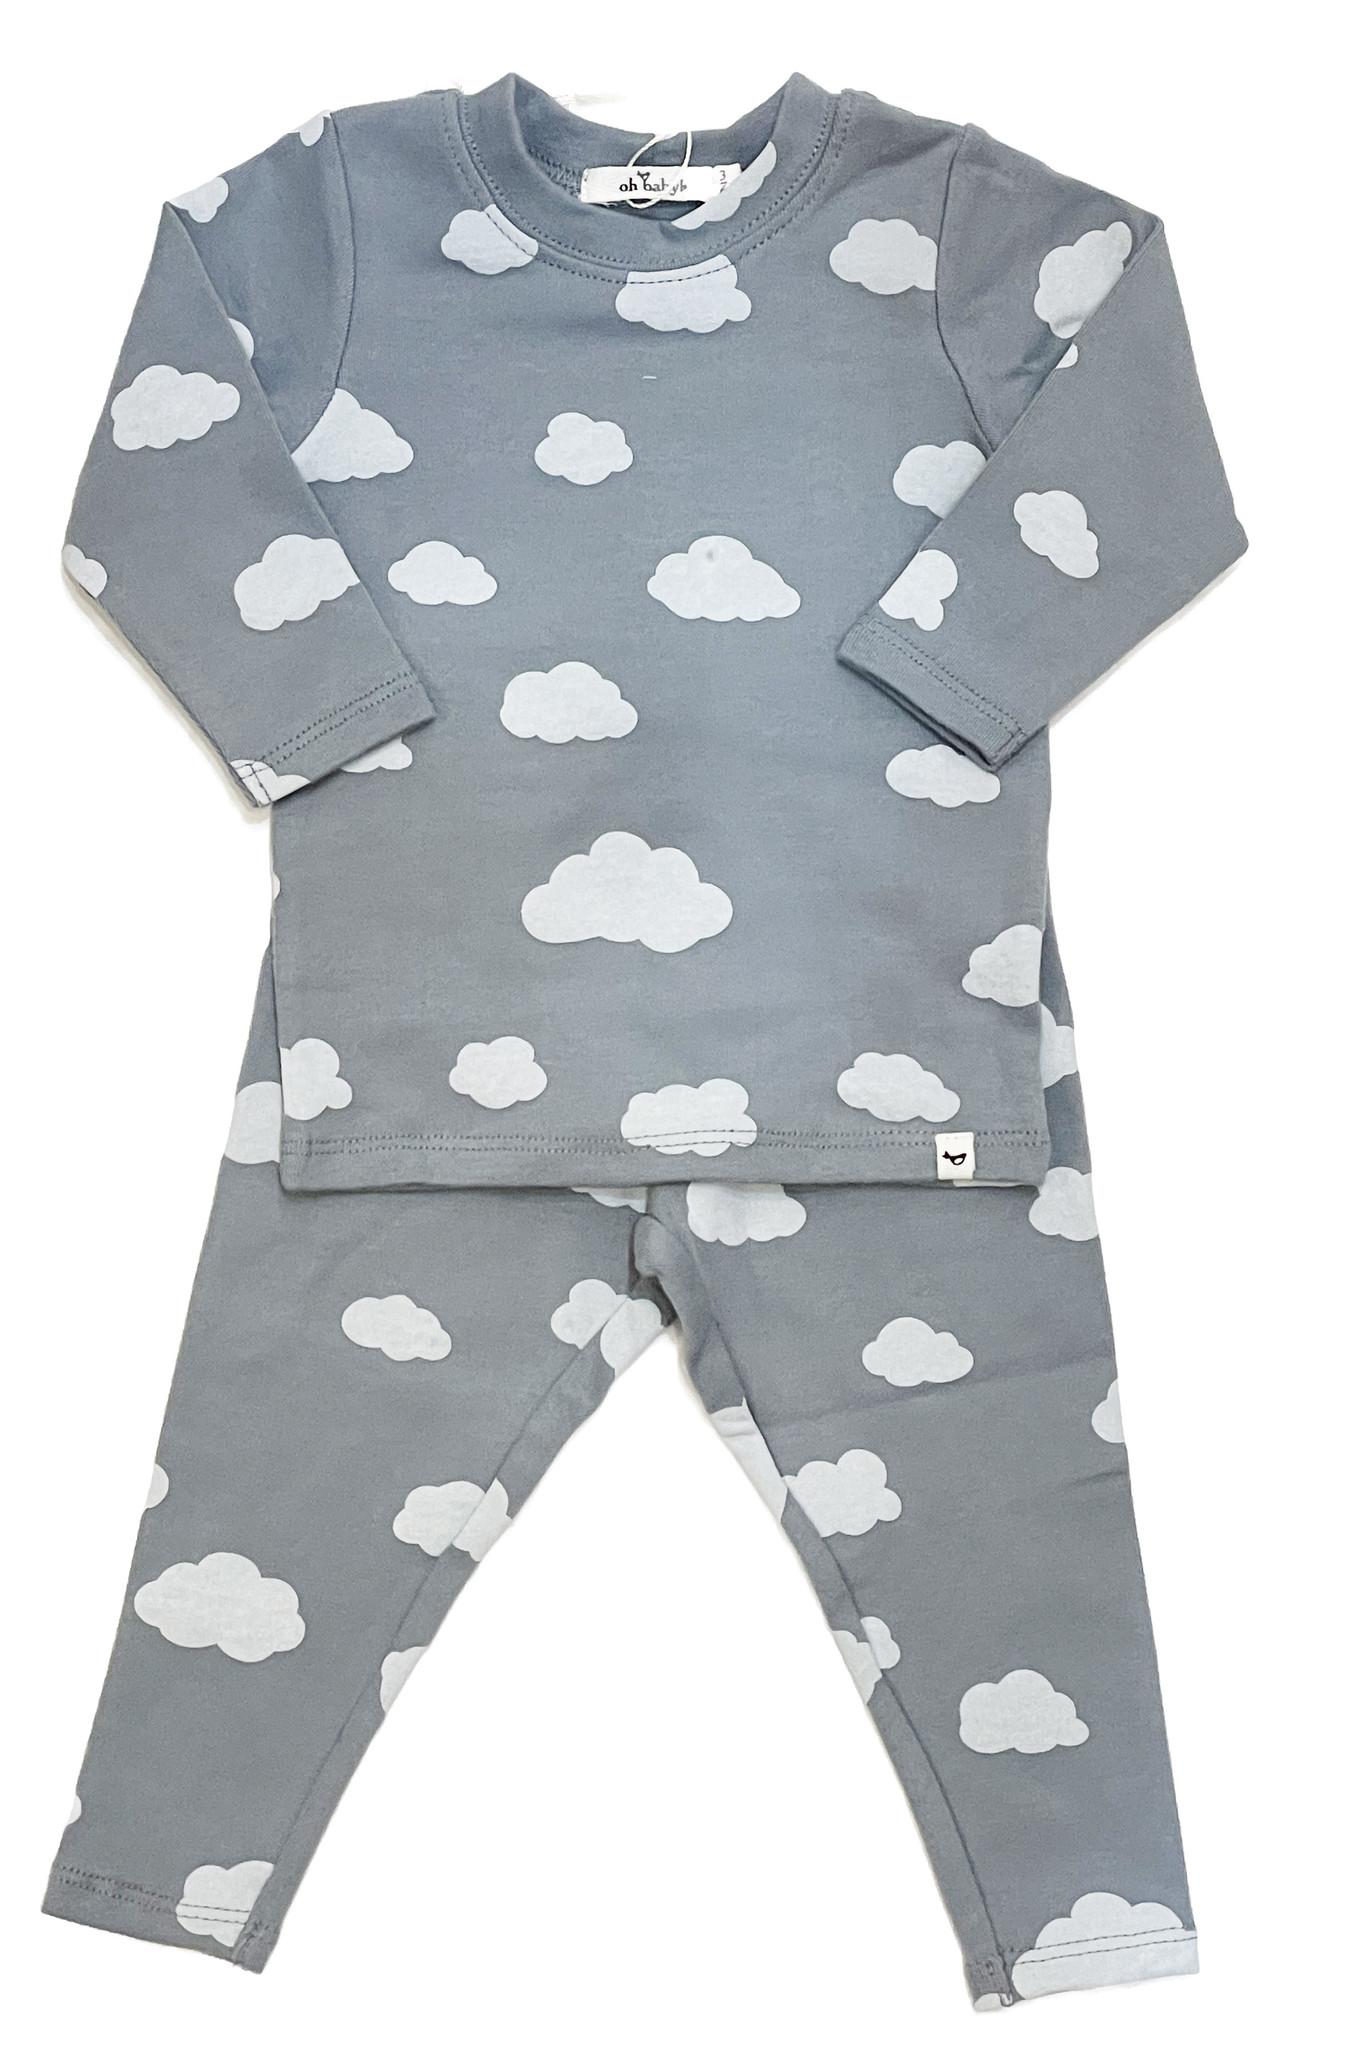 Oh Baby! Fog Mini Clouds 2 pc Set